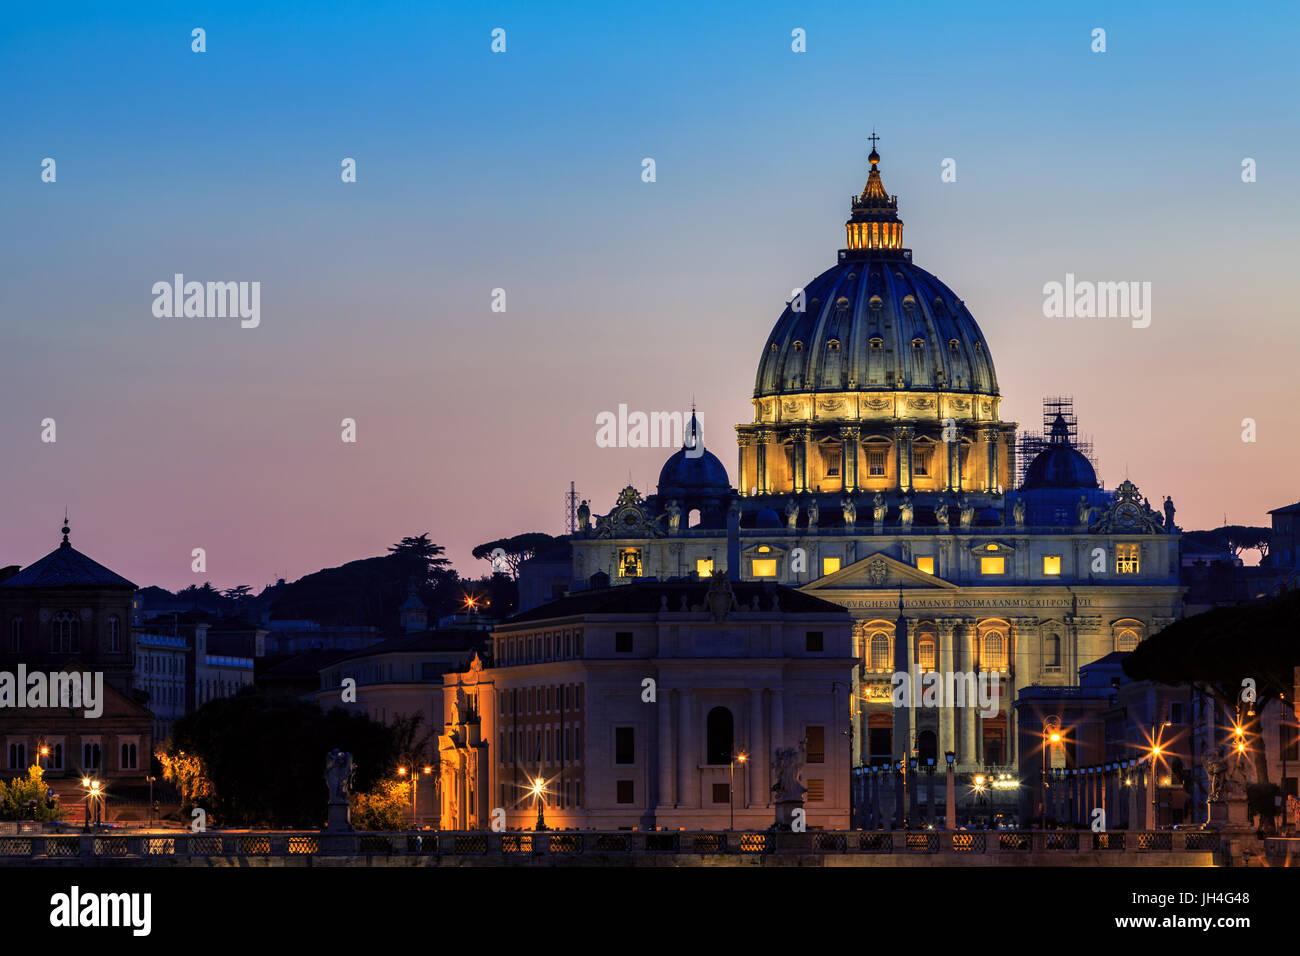 Saint Peter's Basilica at sunset, Rome, Italy Stock Photo